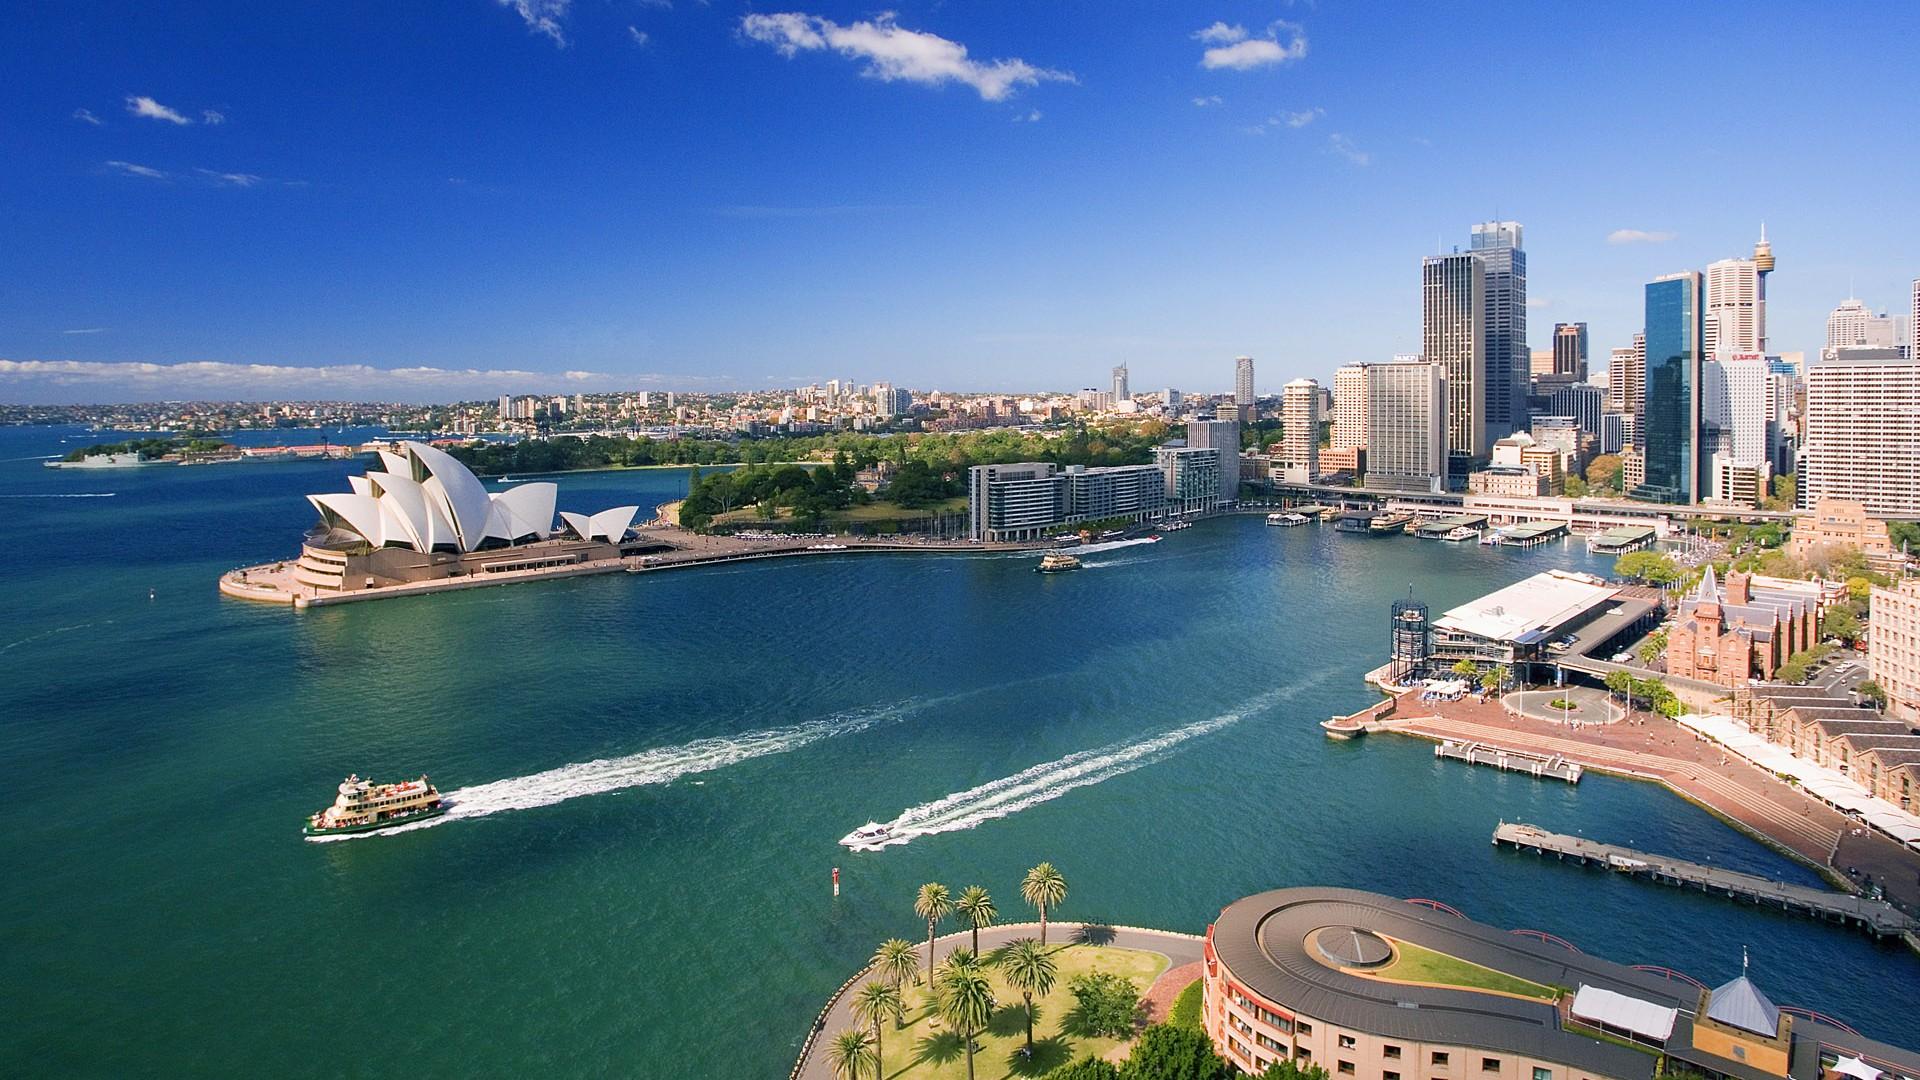 Advantages Of Tourism To The Economy